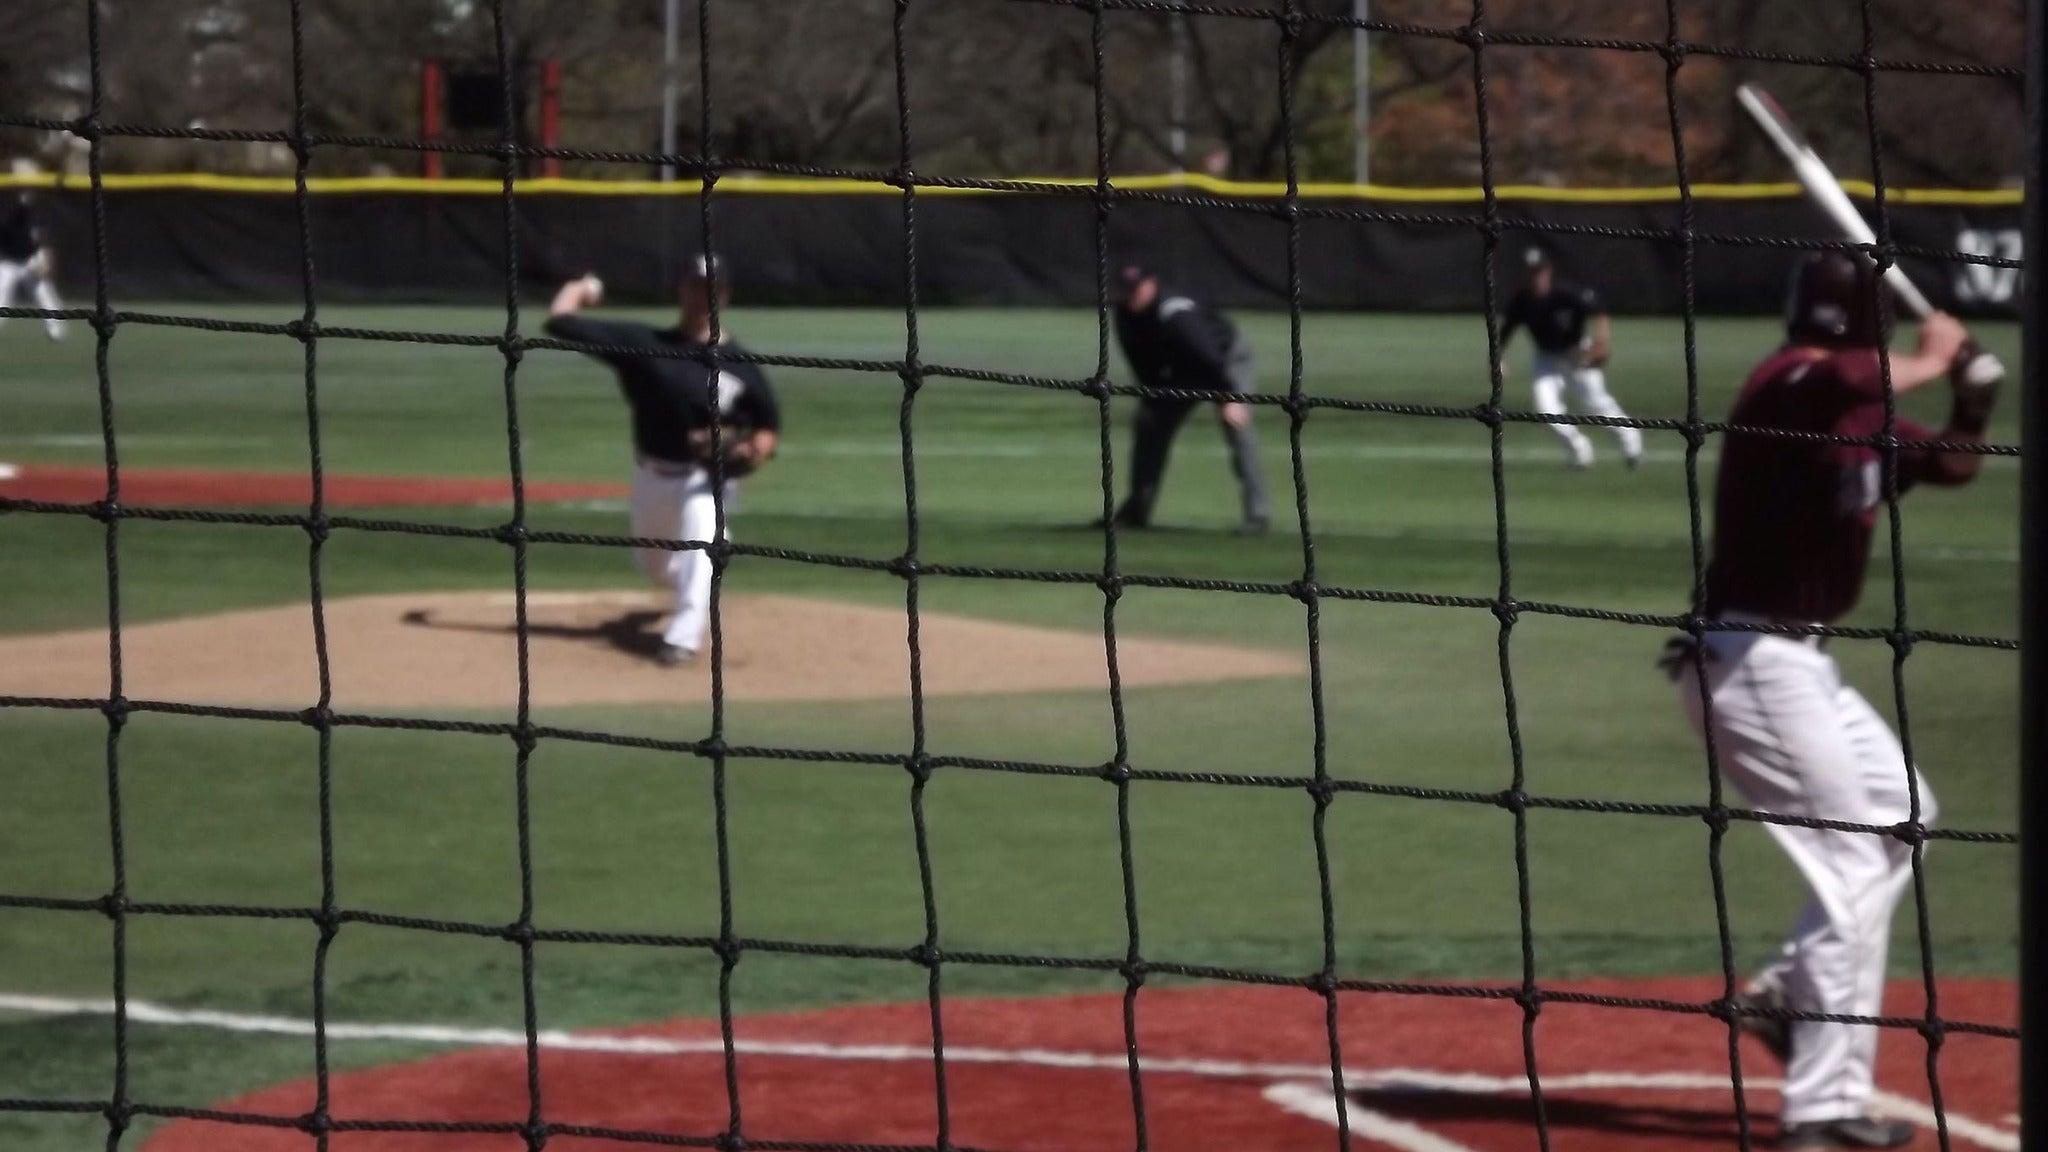 UAB Blazers Baseball at Mississippi State Bulldogs Baseball